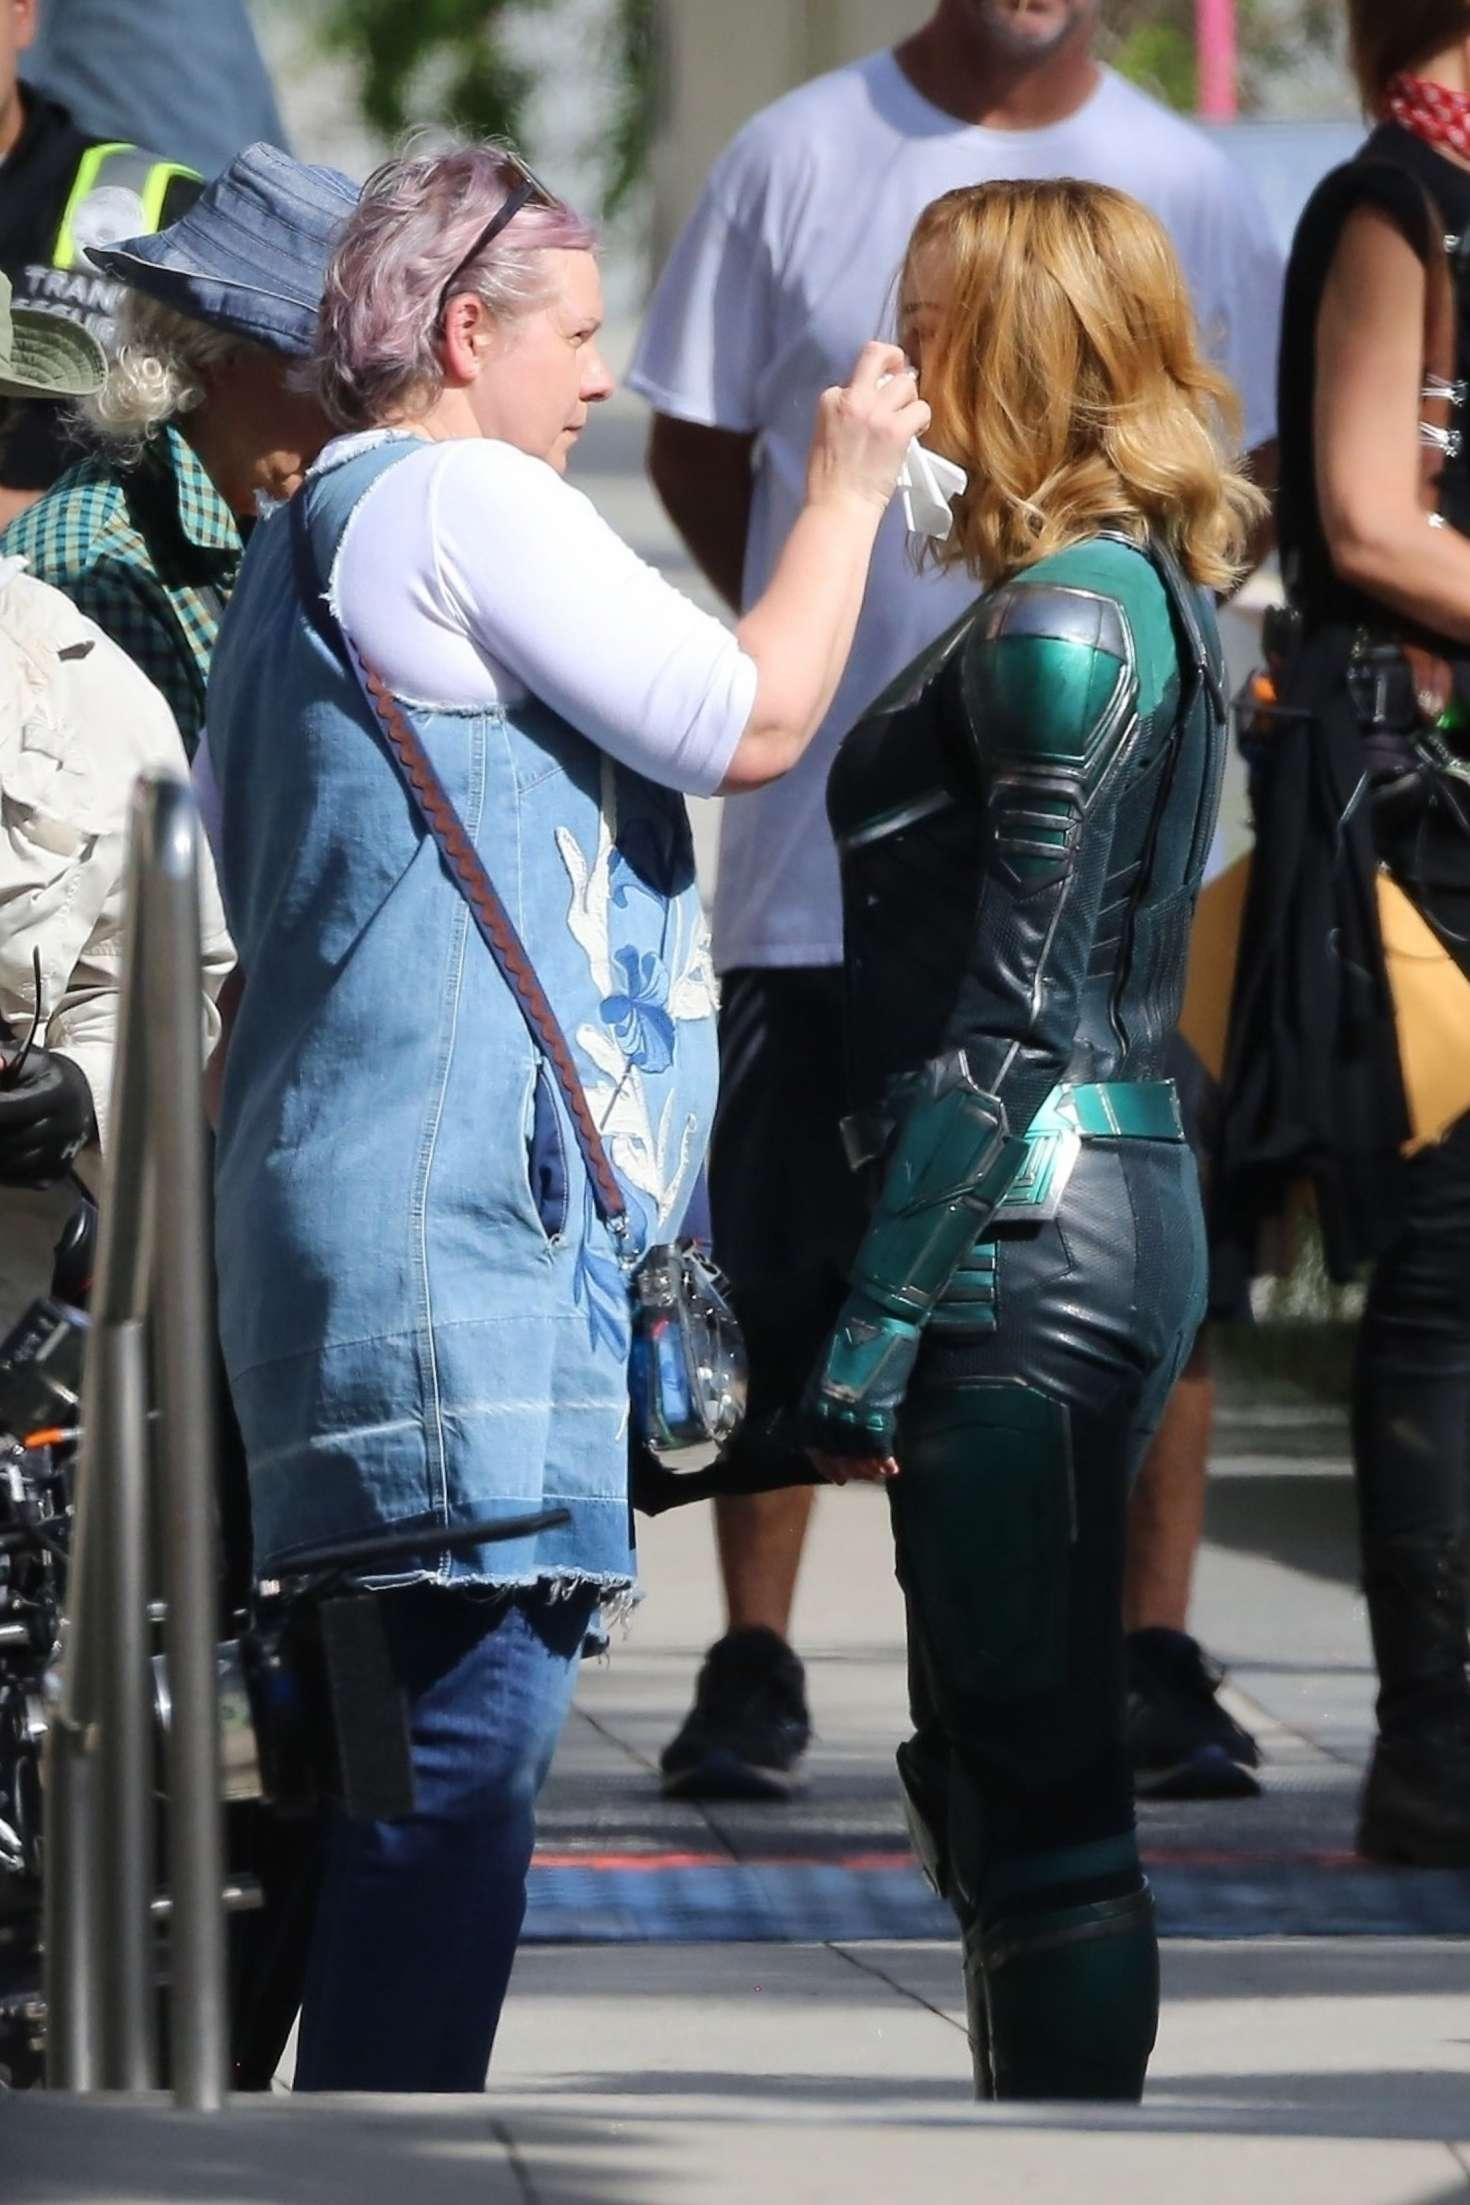 Brie Larson 2018 : Brie Larson: On the set of Captain Marvel -08